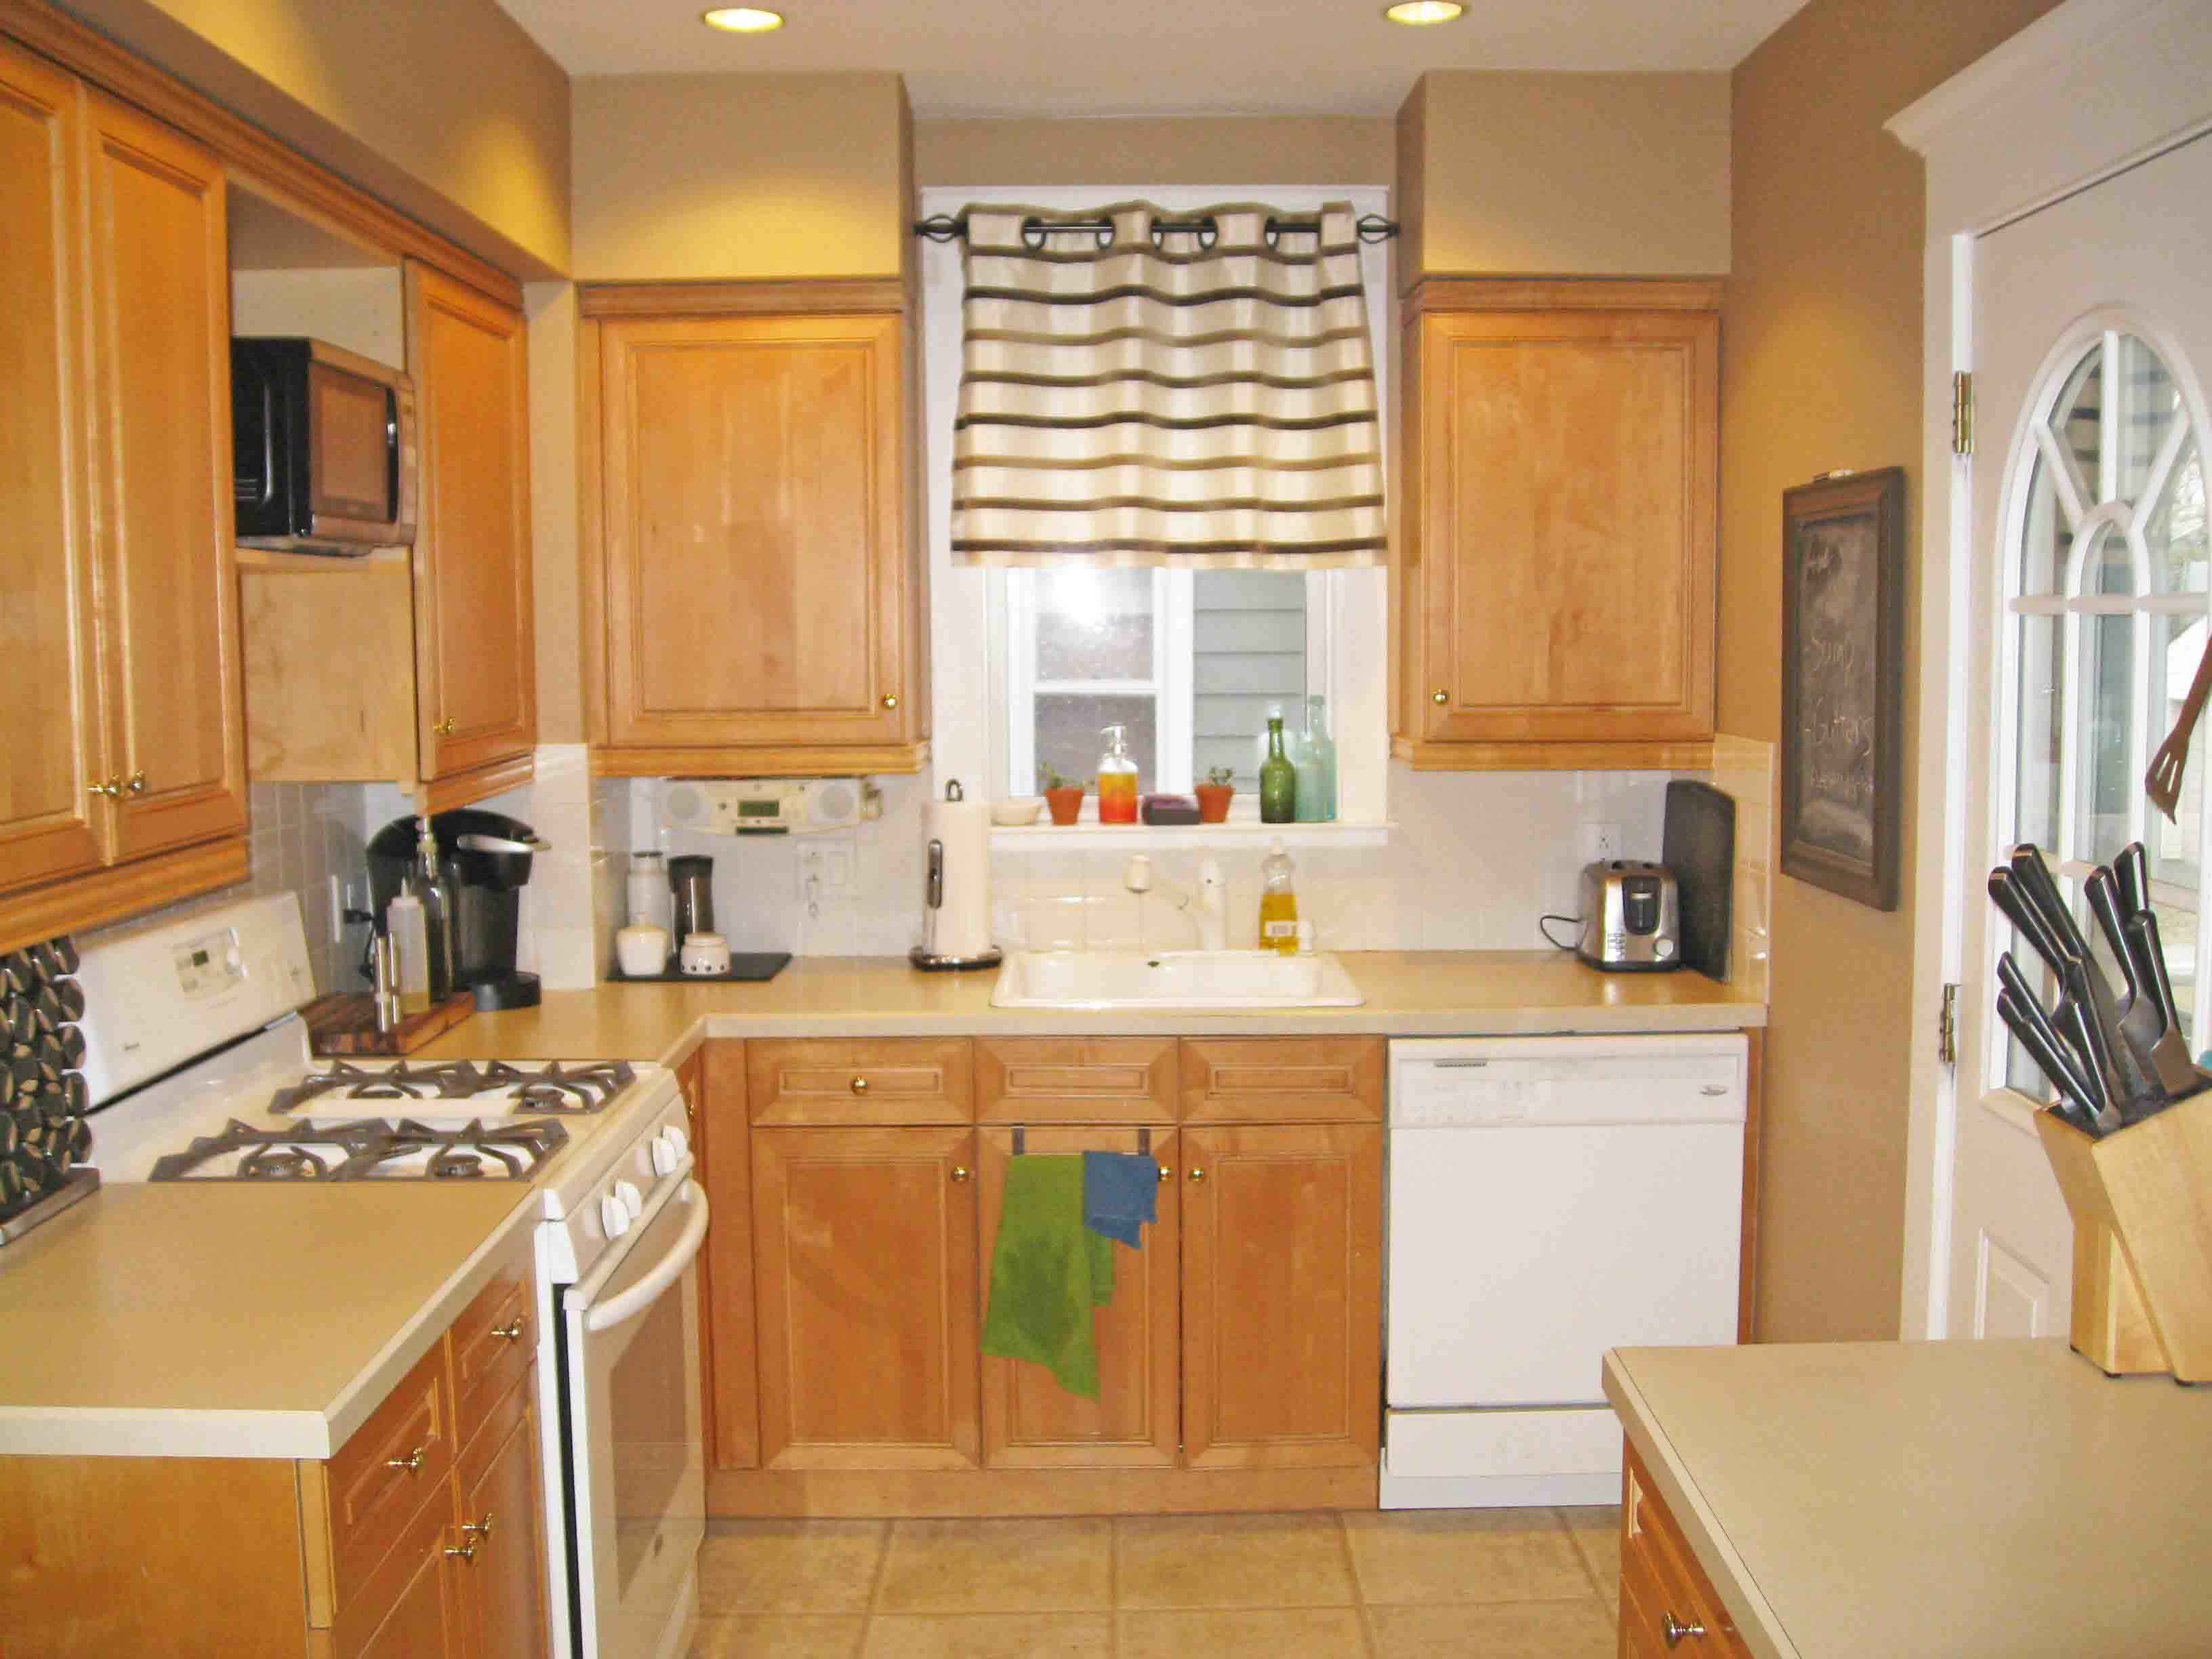 90s sunshineandsawdust for 90s kitchen remodel